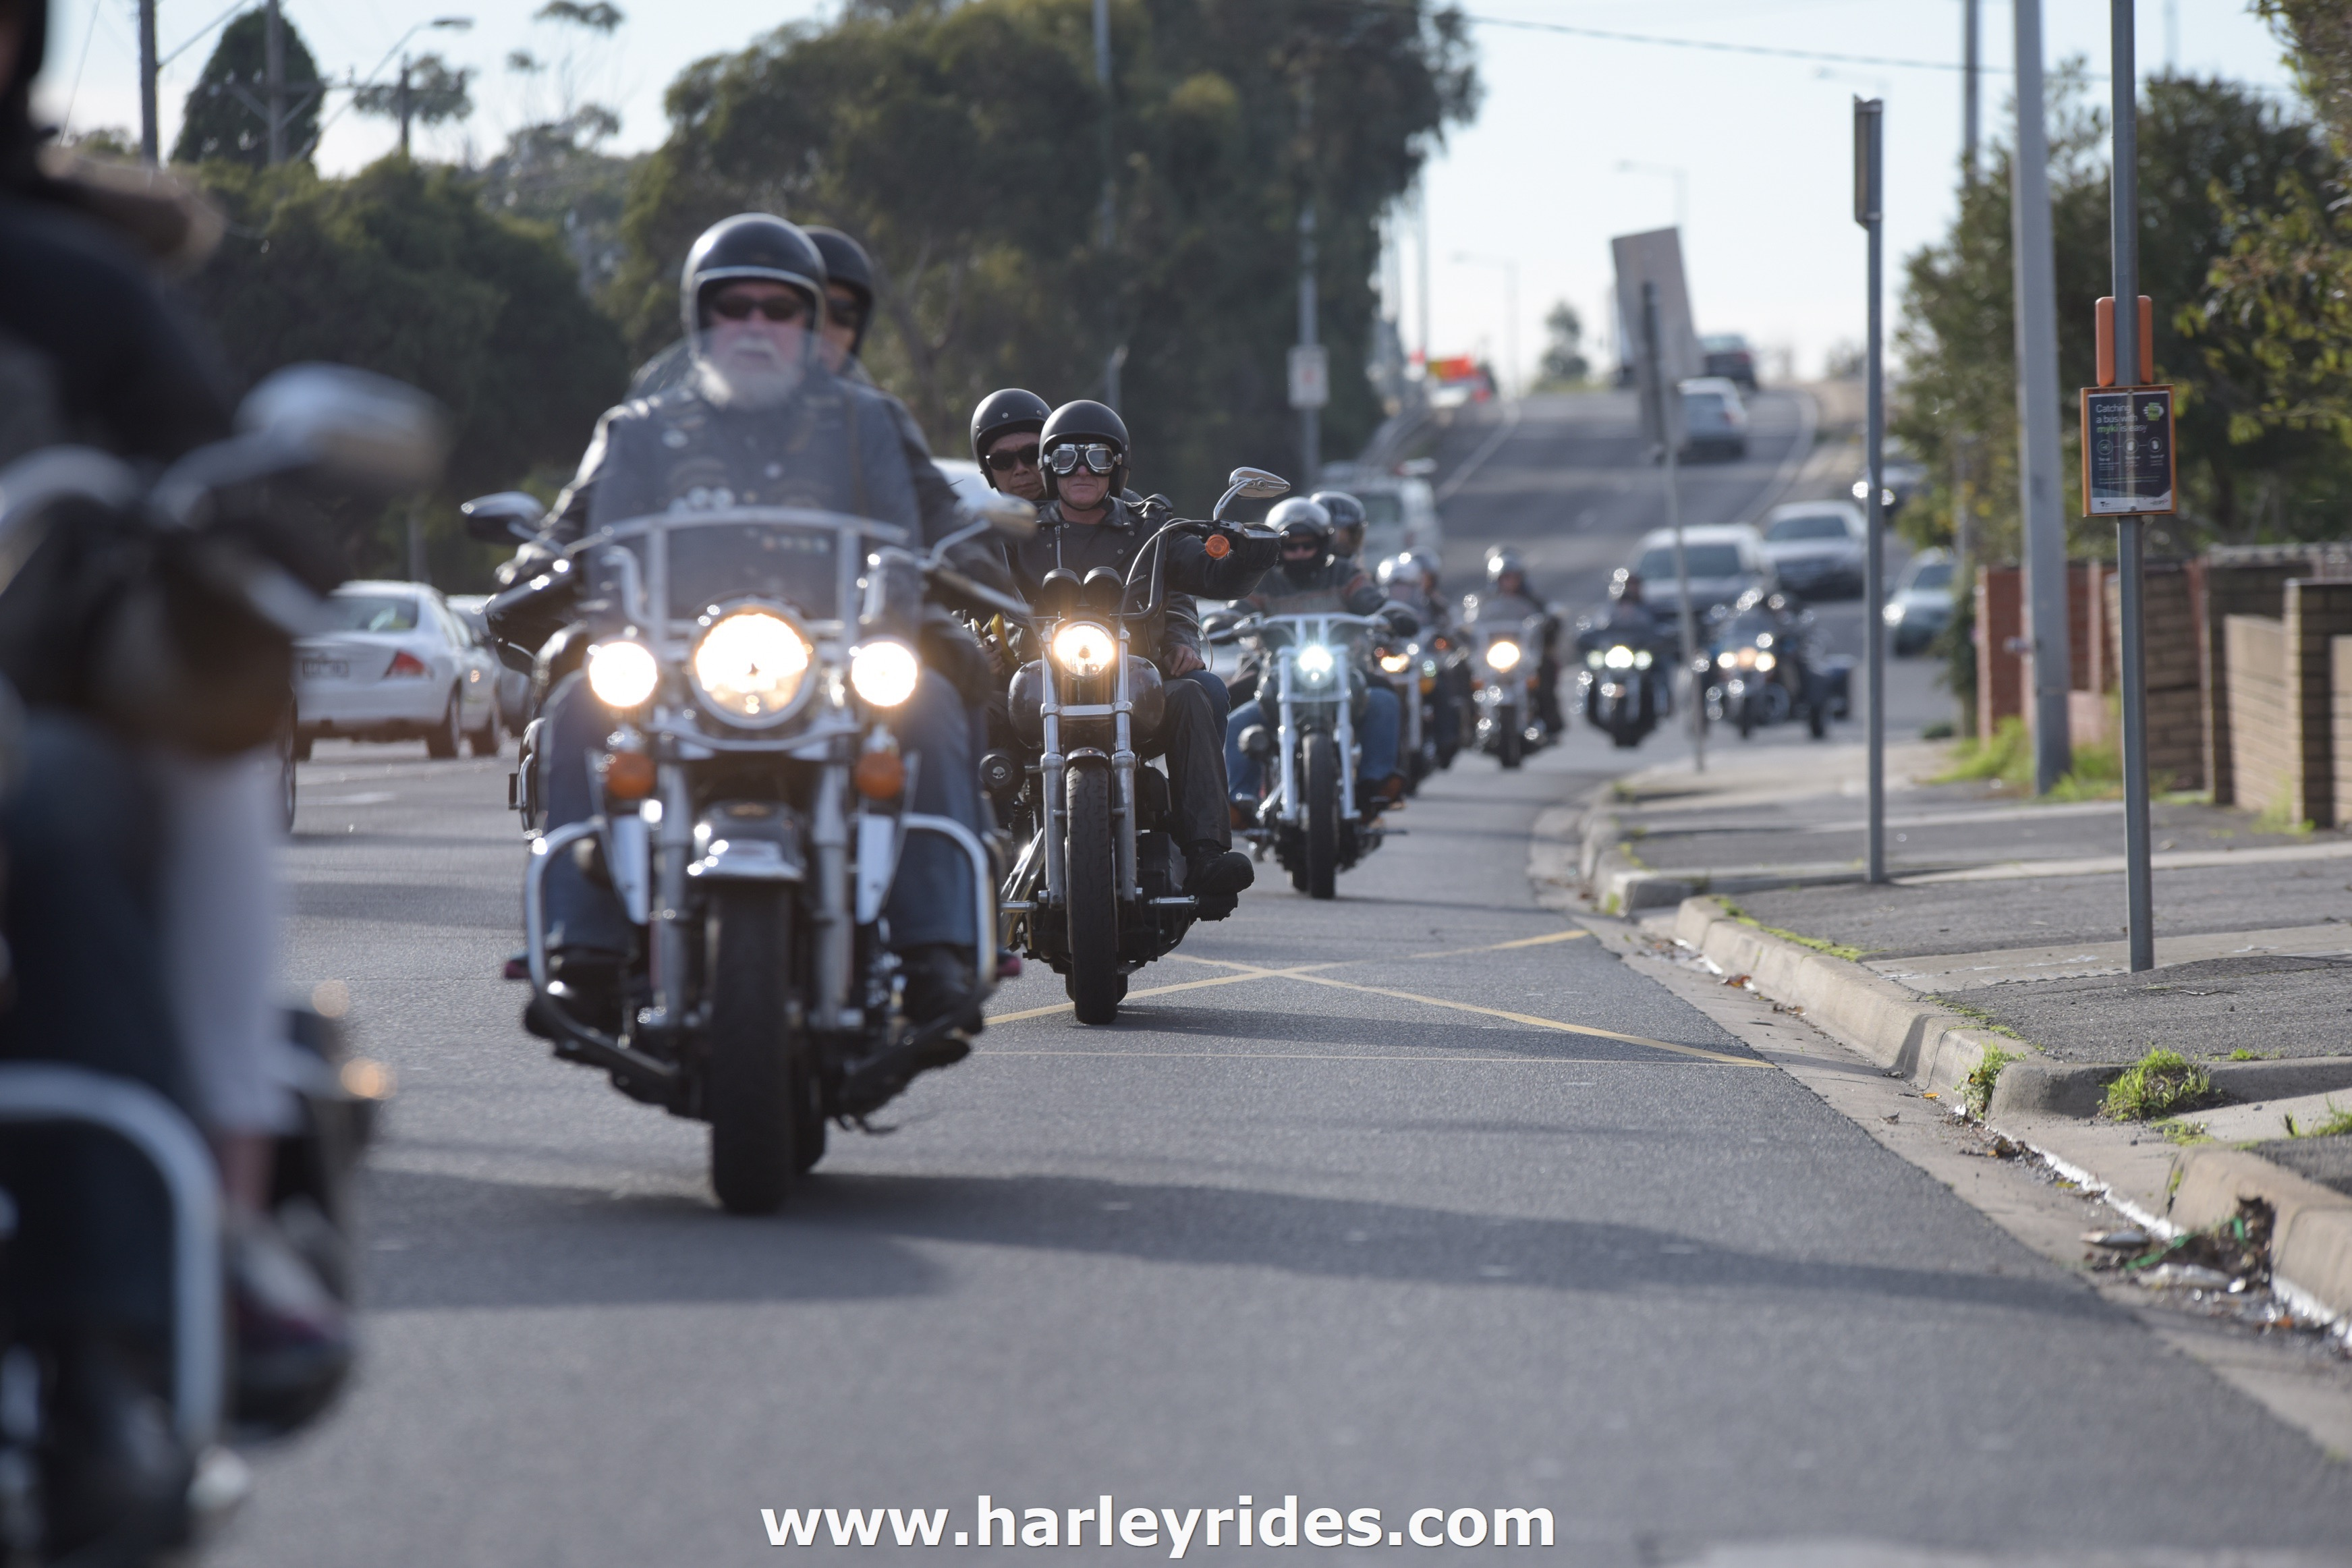 HarleyDavidsonGroupRide (36).jpg